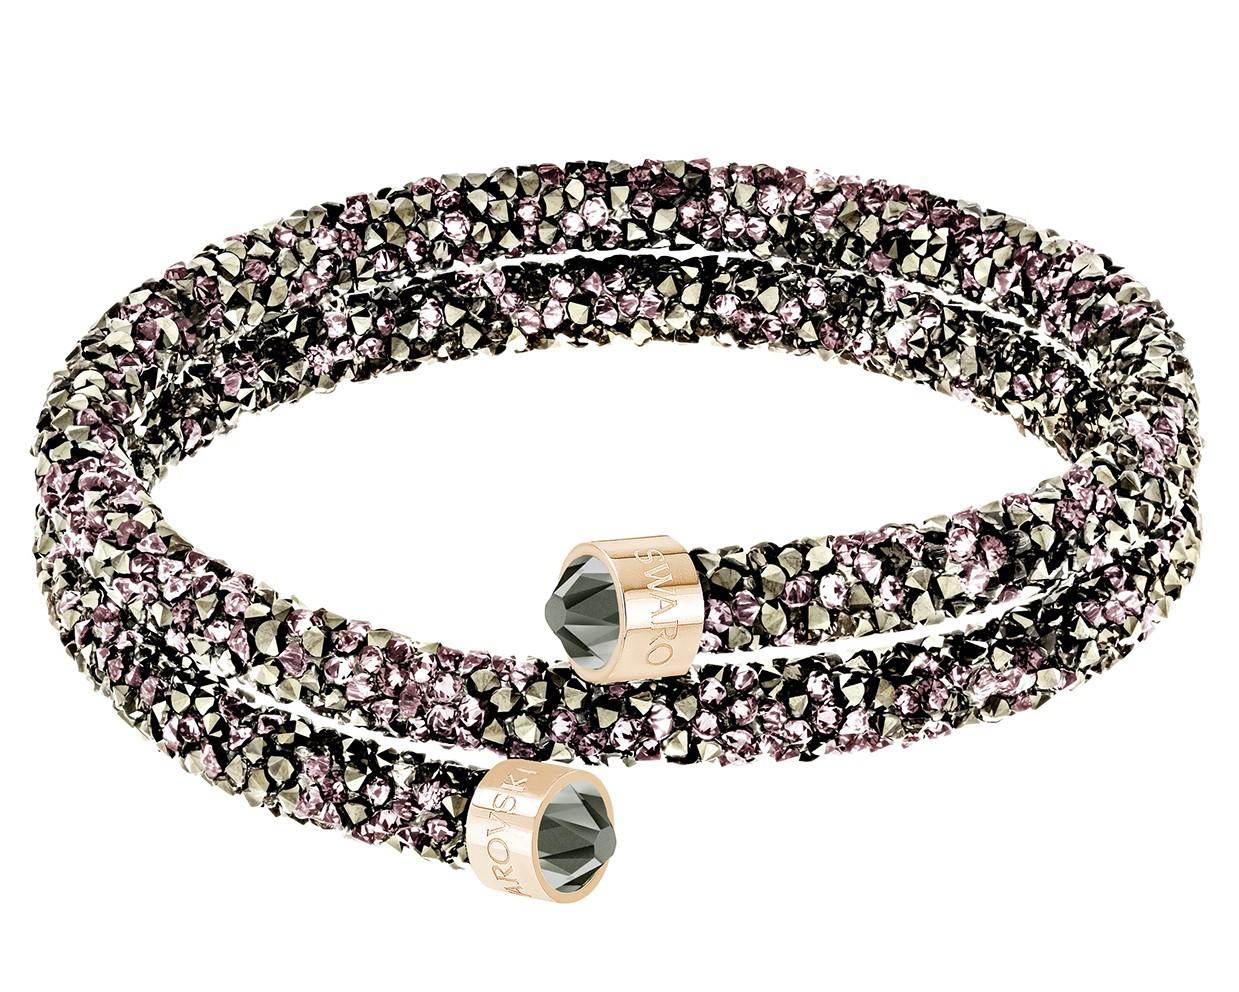 Swarovski Armband Crystaldust Bangle Double Brown-Rosegold M 5348102